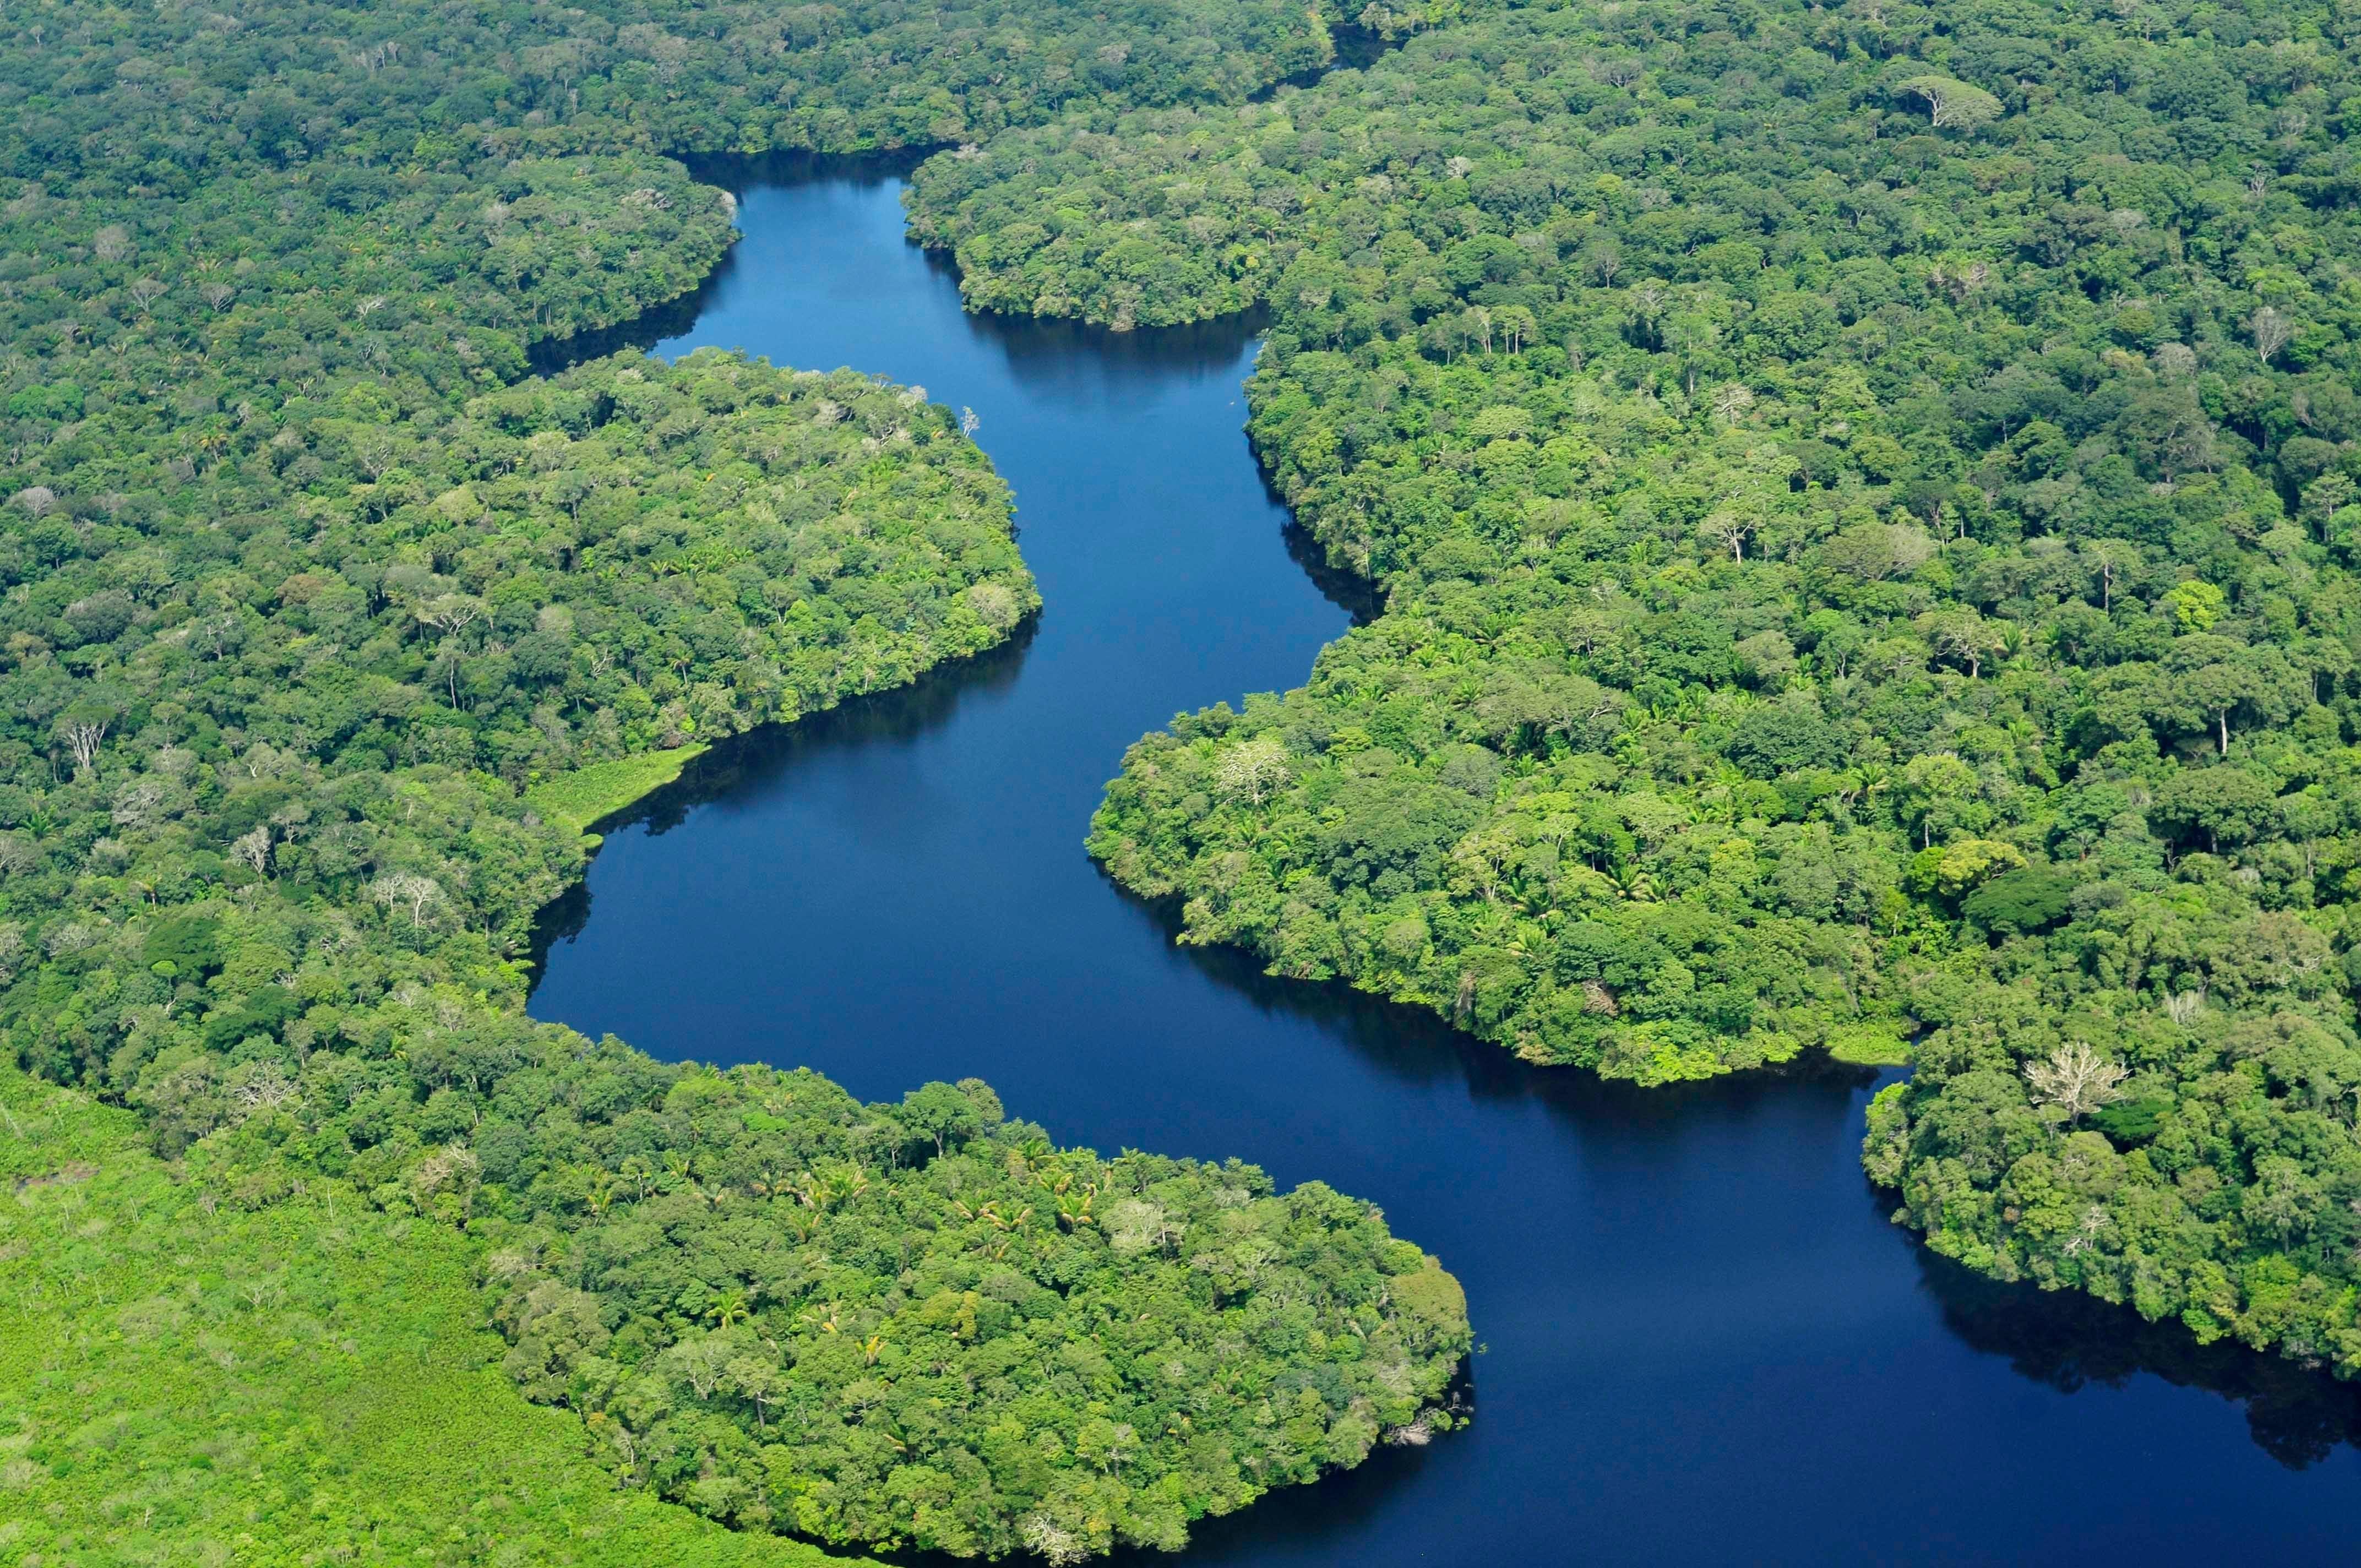 Drawn rainforest forest river The & Games Rainforest Rainforest